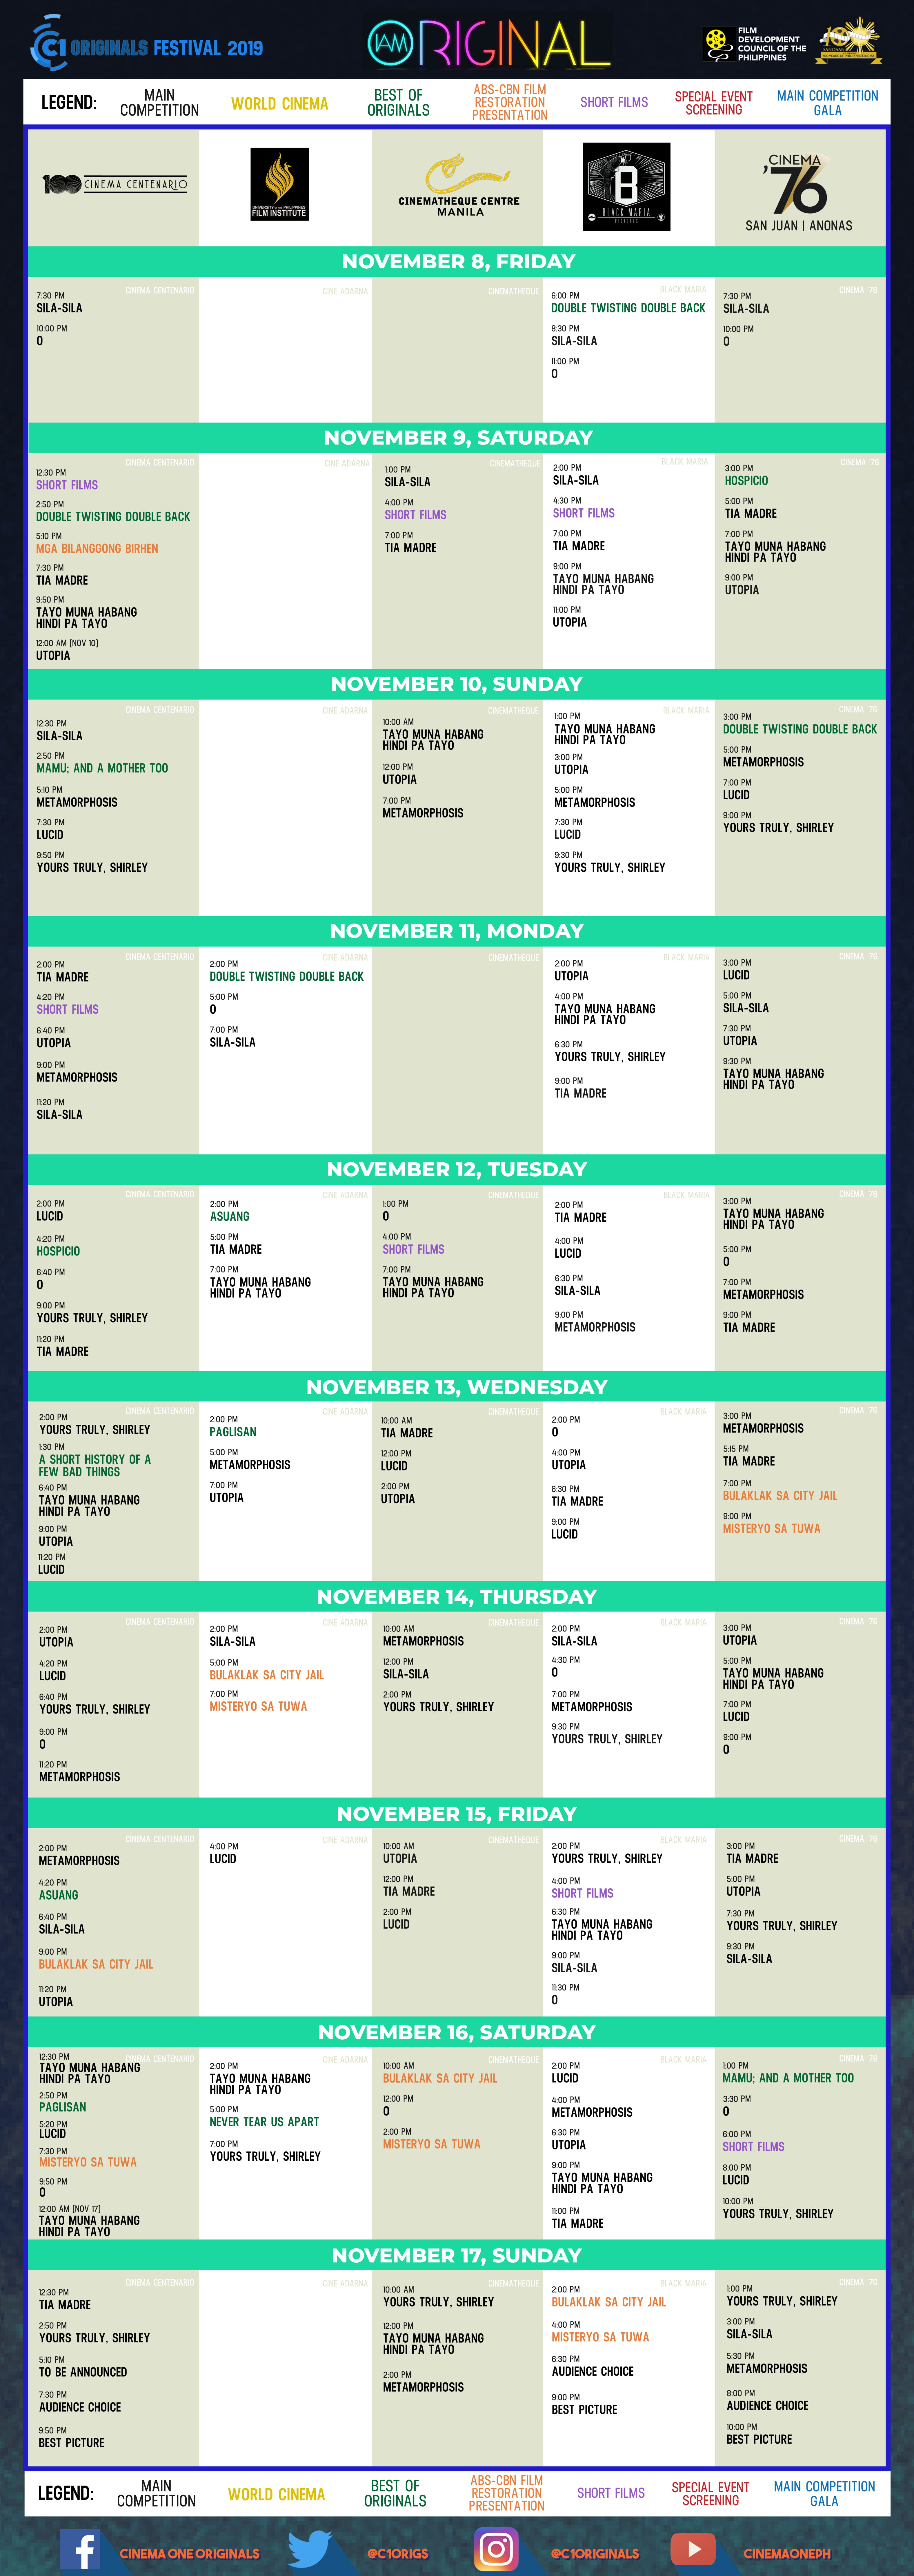 cinema one originals full schedule clickthecity